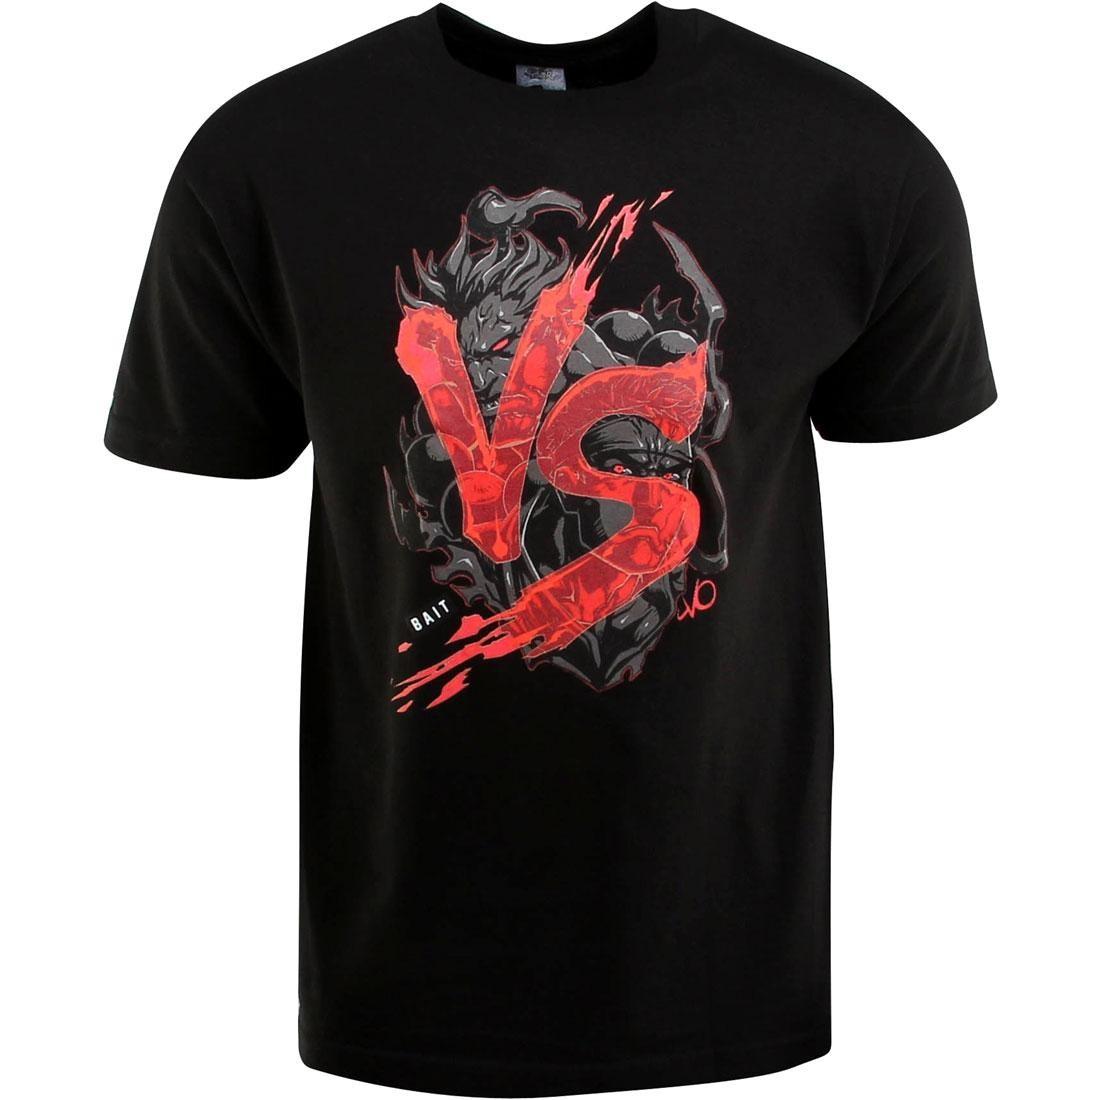 BAIT x Street Fighter Akuma VS Ryu Tee - Long Vo (black / black) - BAIT SDCC Exclusive